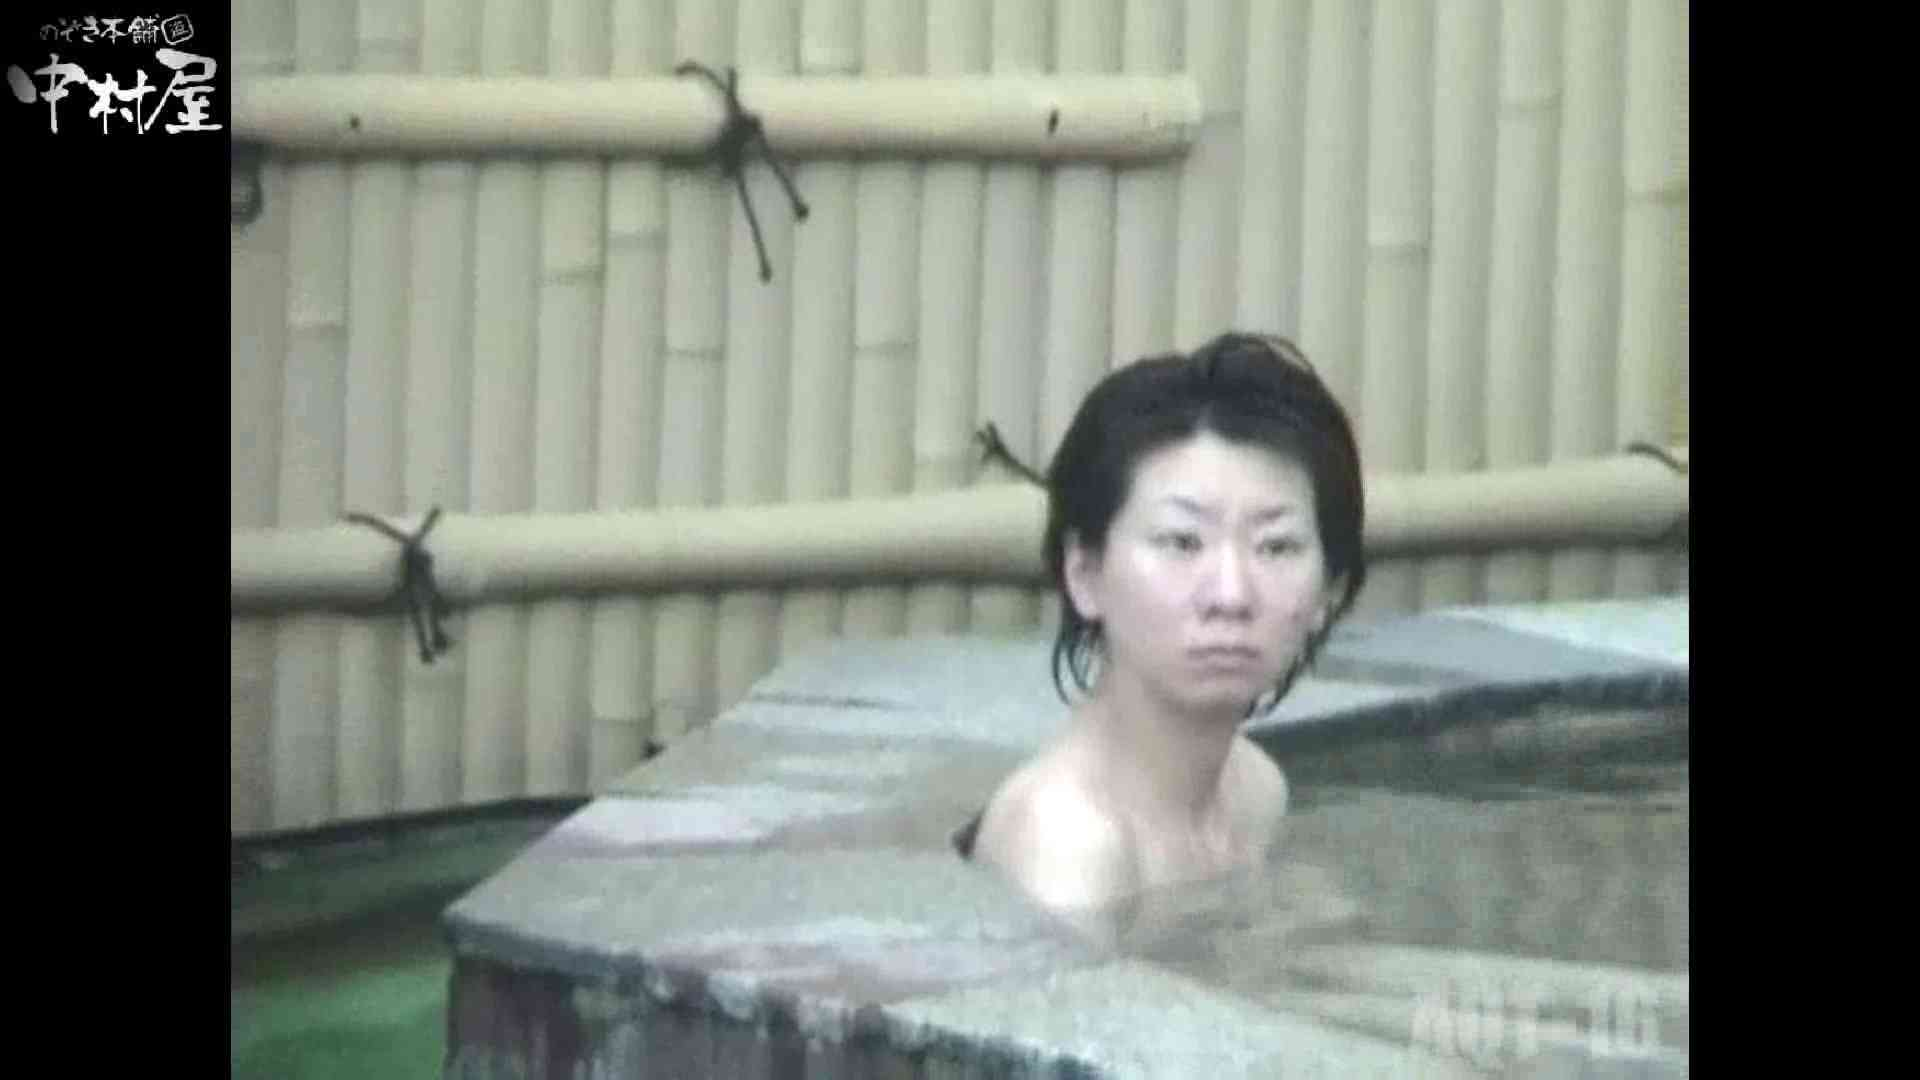 Aquaな露天風呂Vol.880潜入盗撮露天風呂十六判湯 其の三 盗撮師作品  100pic 68